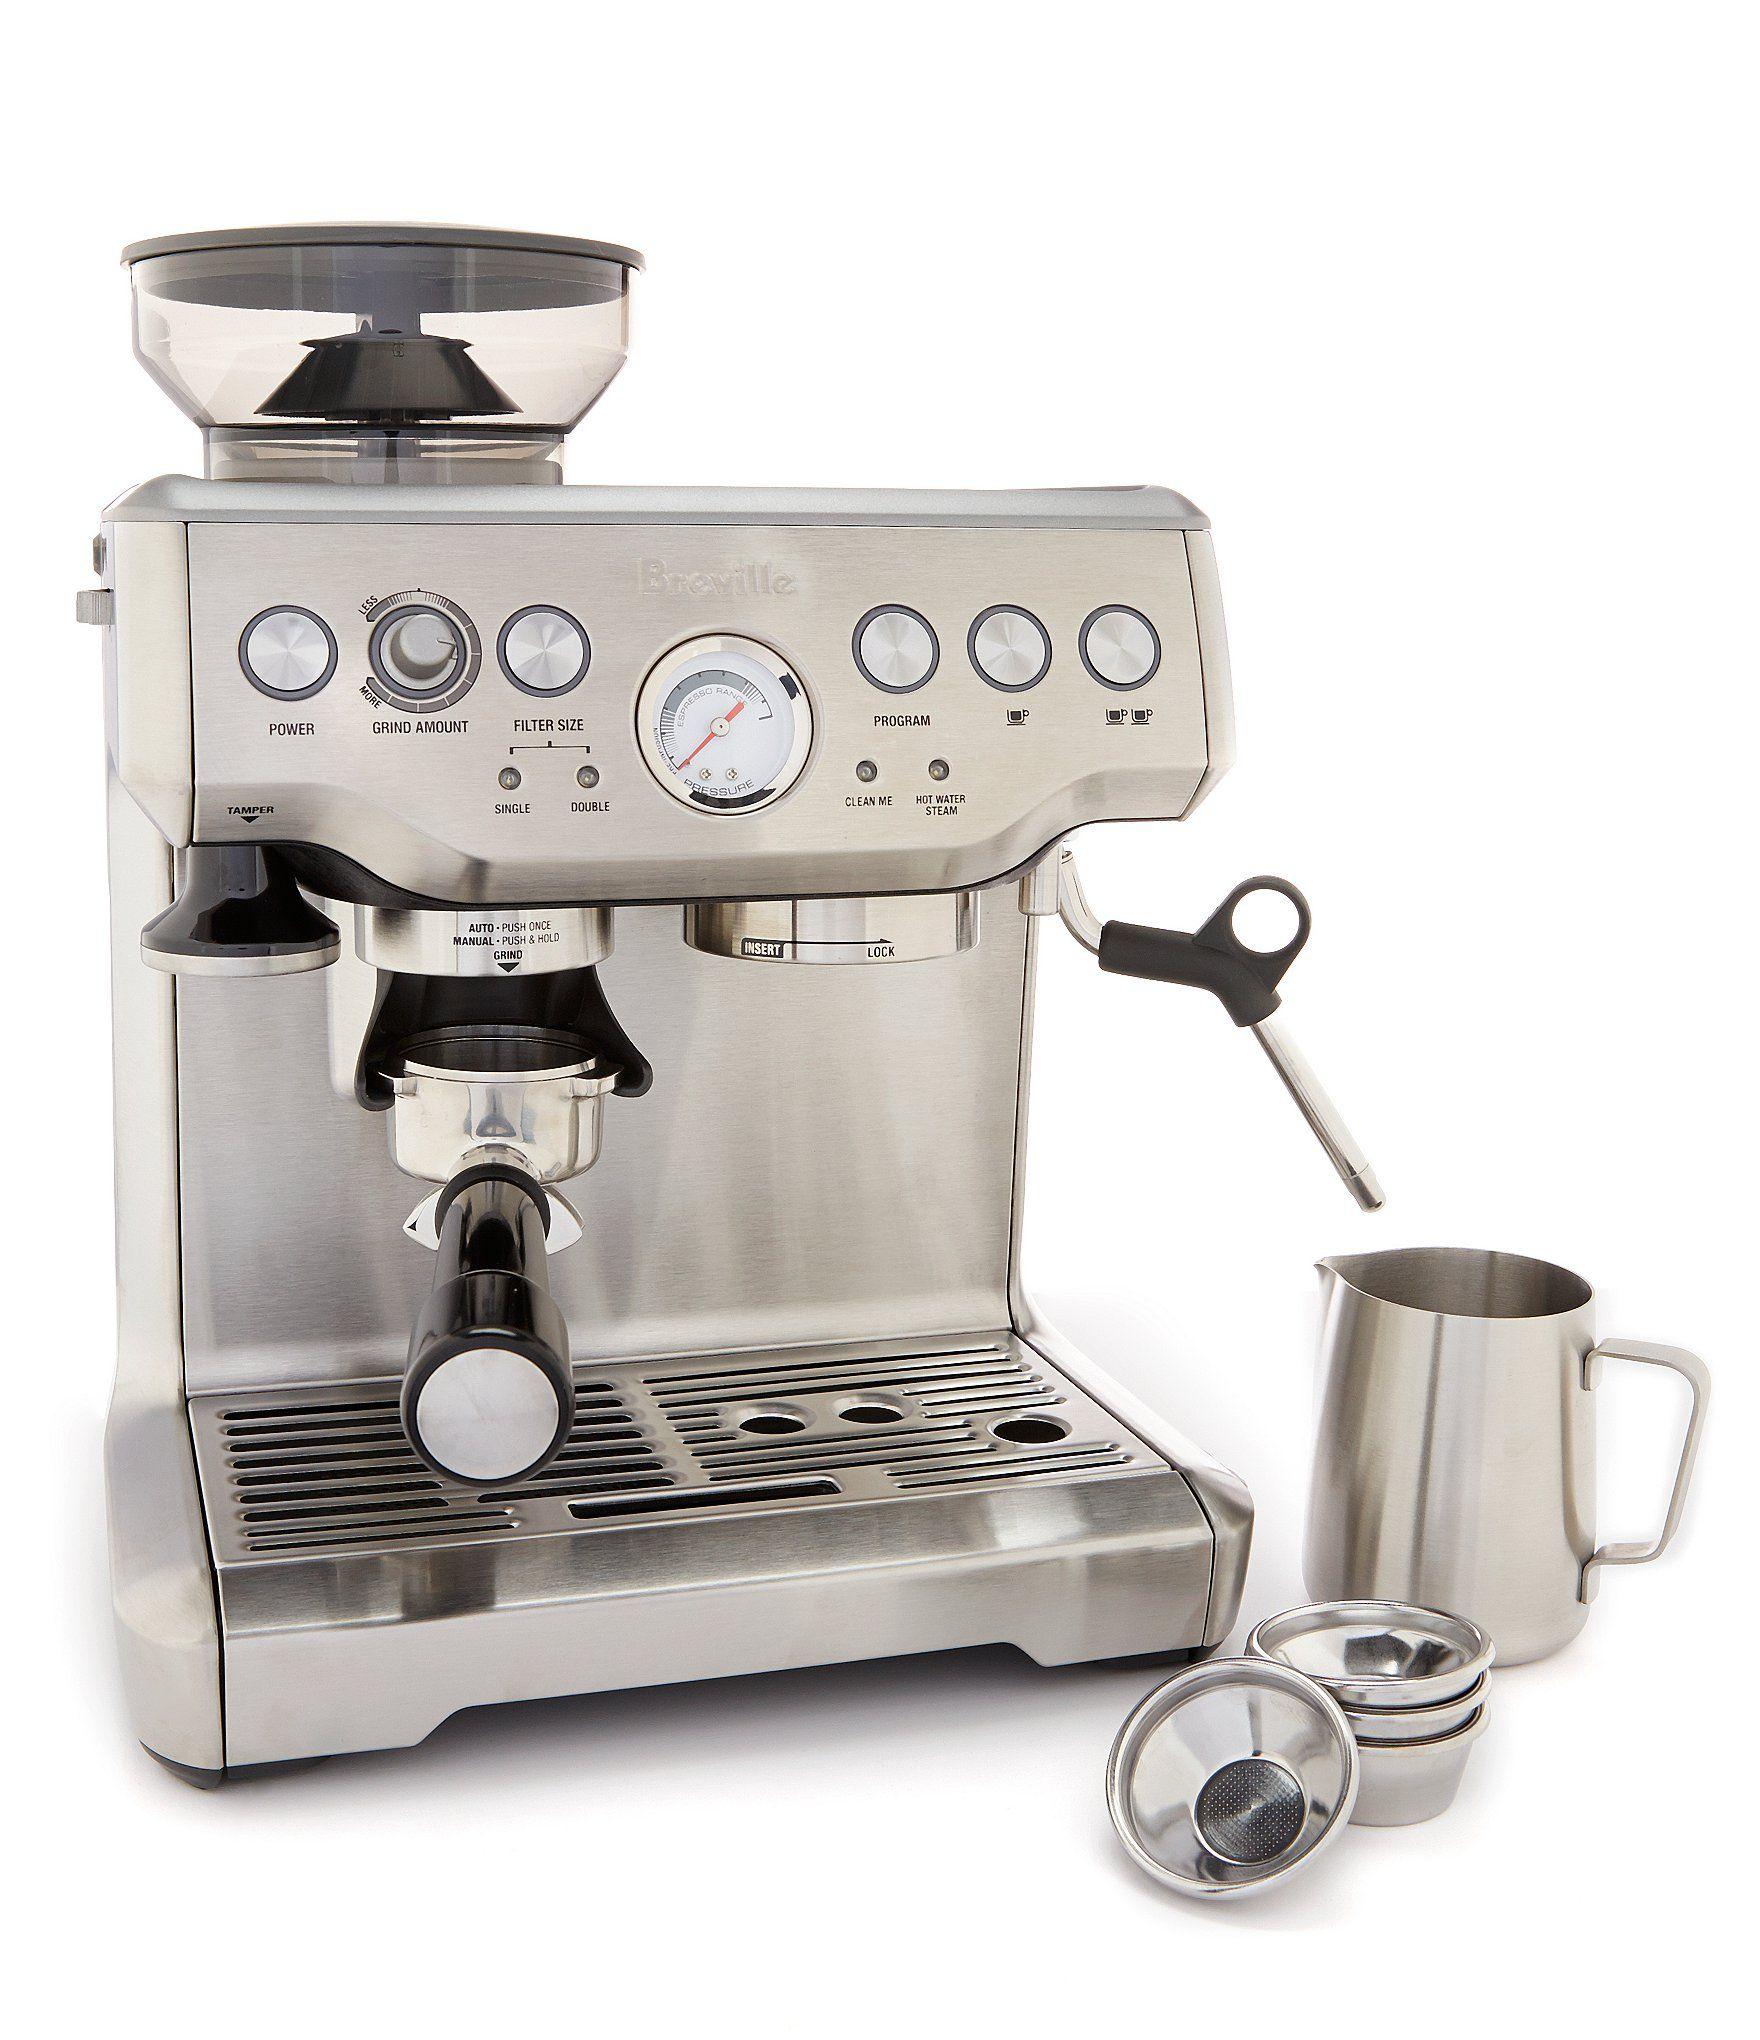 Breville Barista Express Espresso Machine With Integrated Grinder In 2020 Breville Barista Express Espresso Machine Breville